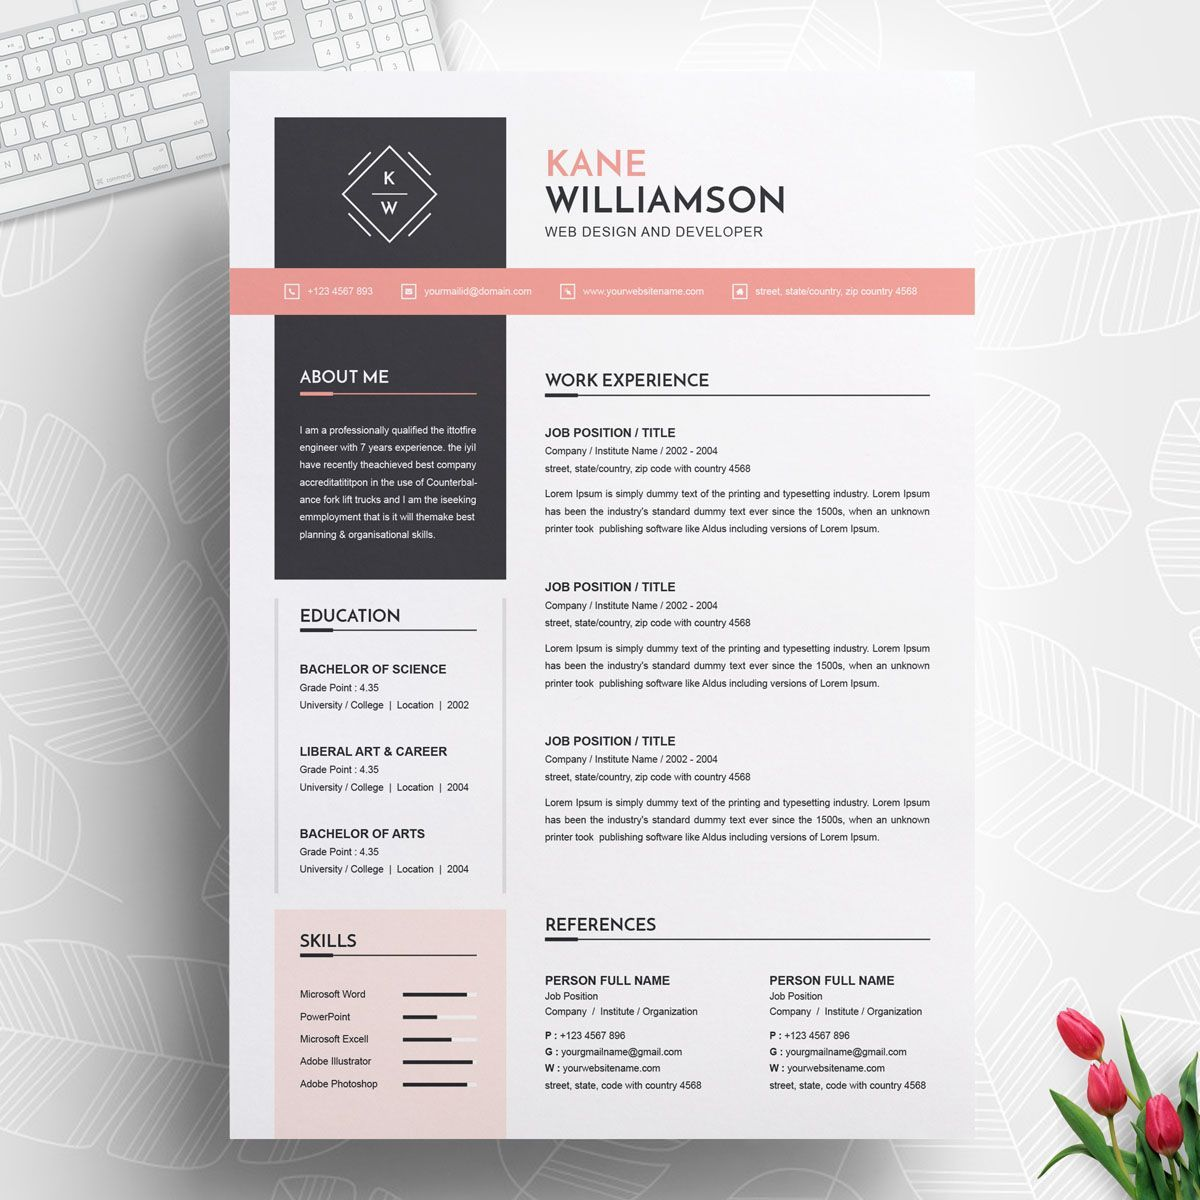 Kane Williamson Resume Template 74143 Cv design